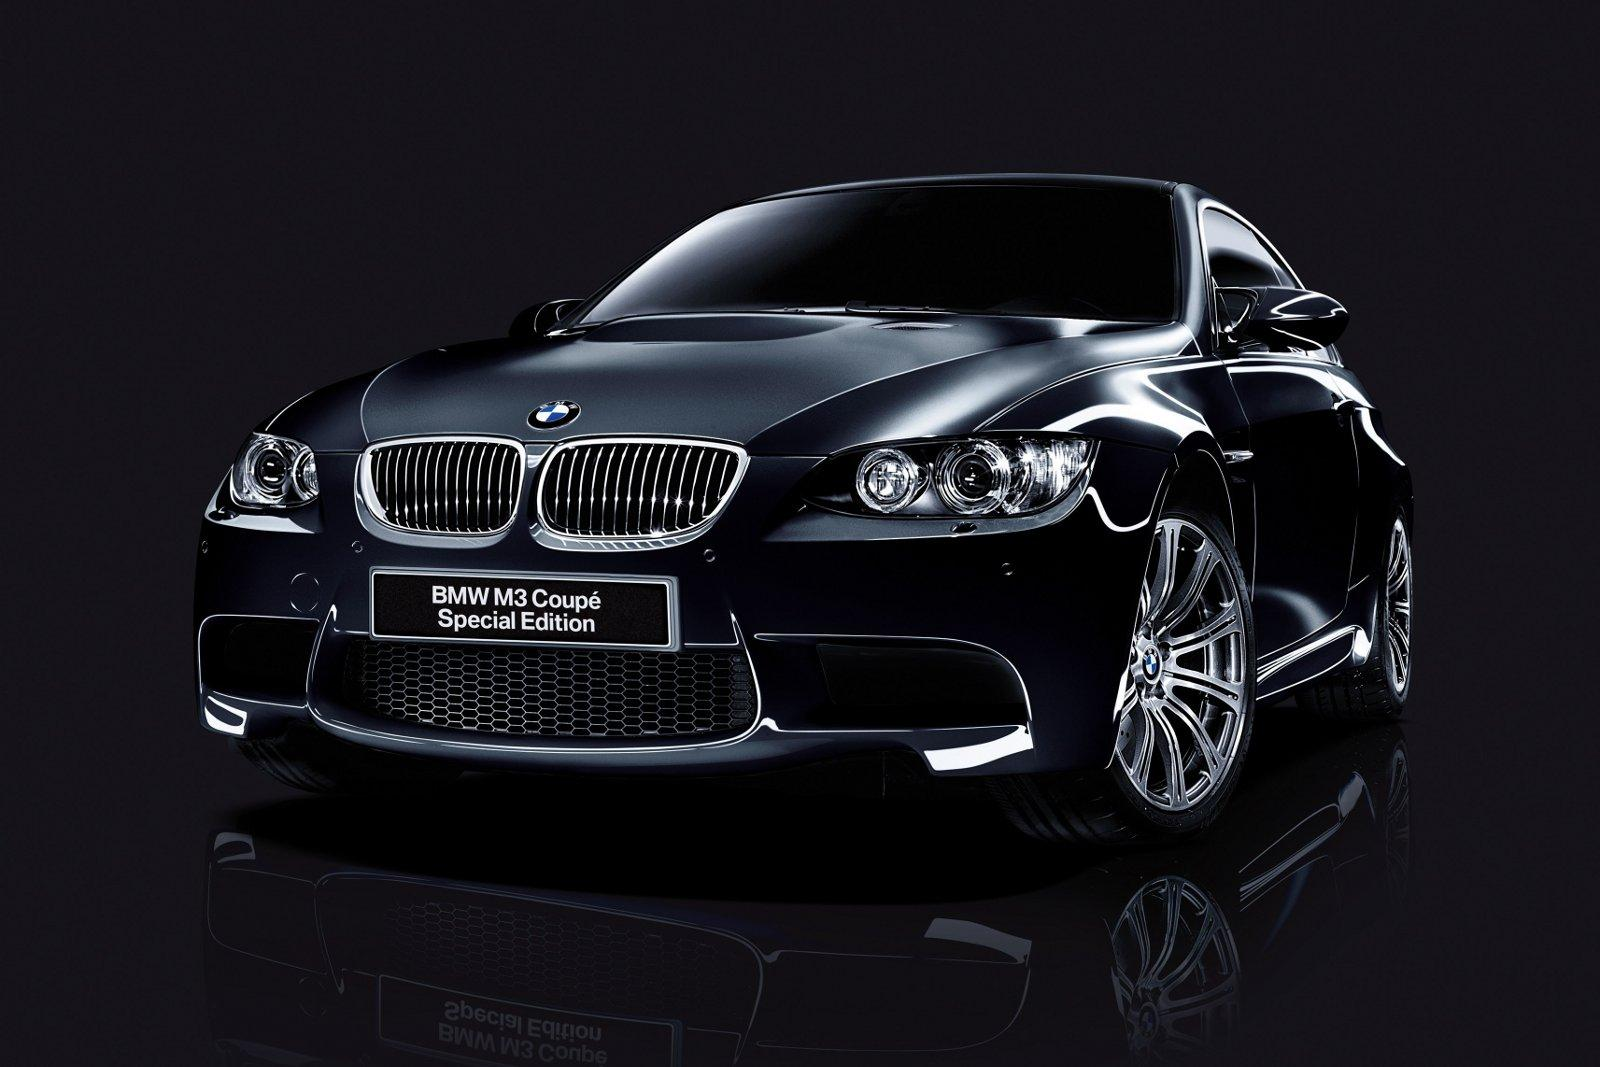 BMW E92 M3 Matte Edition